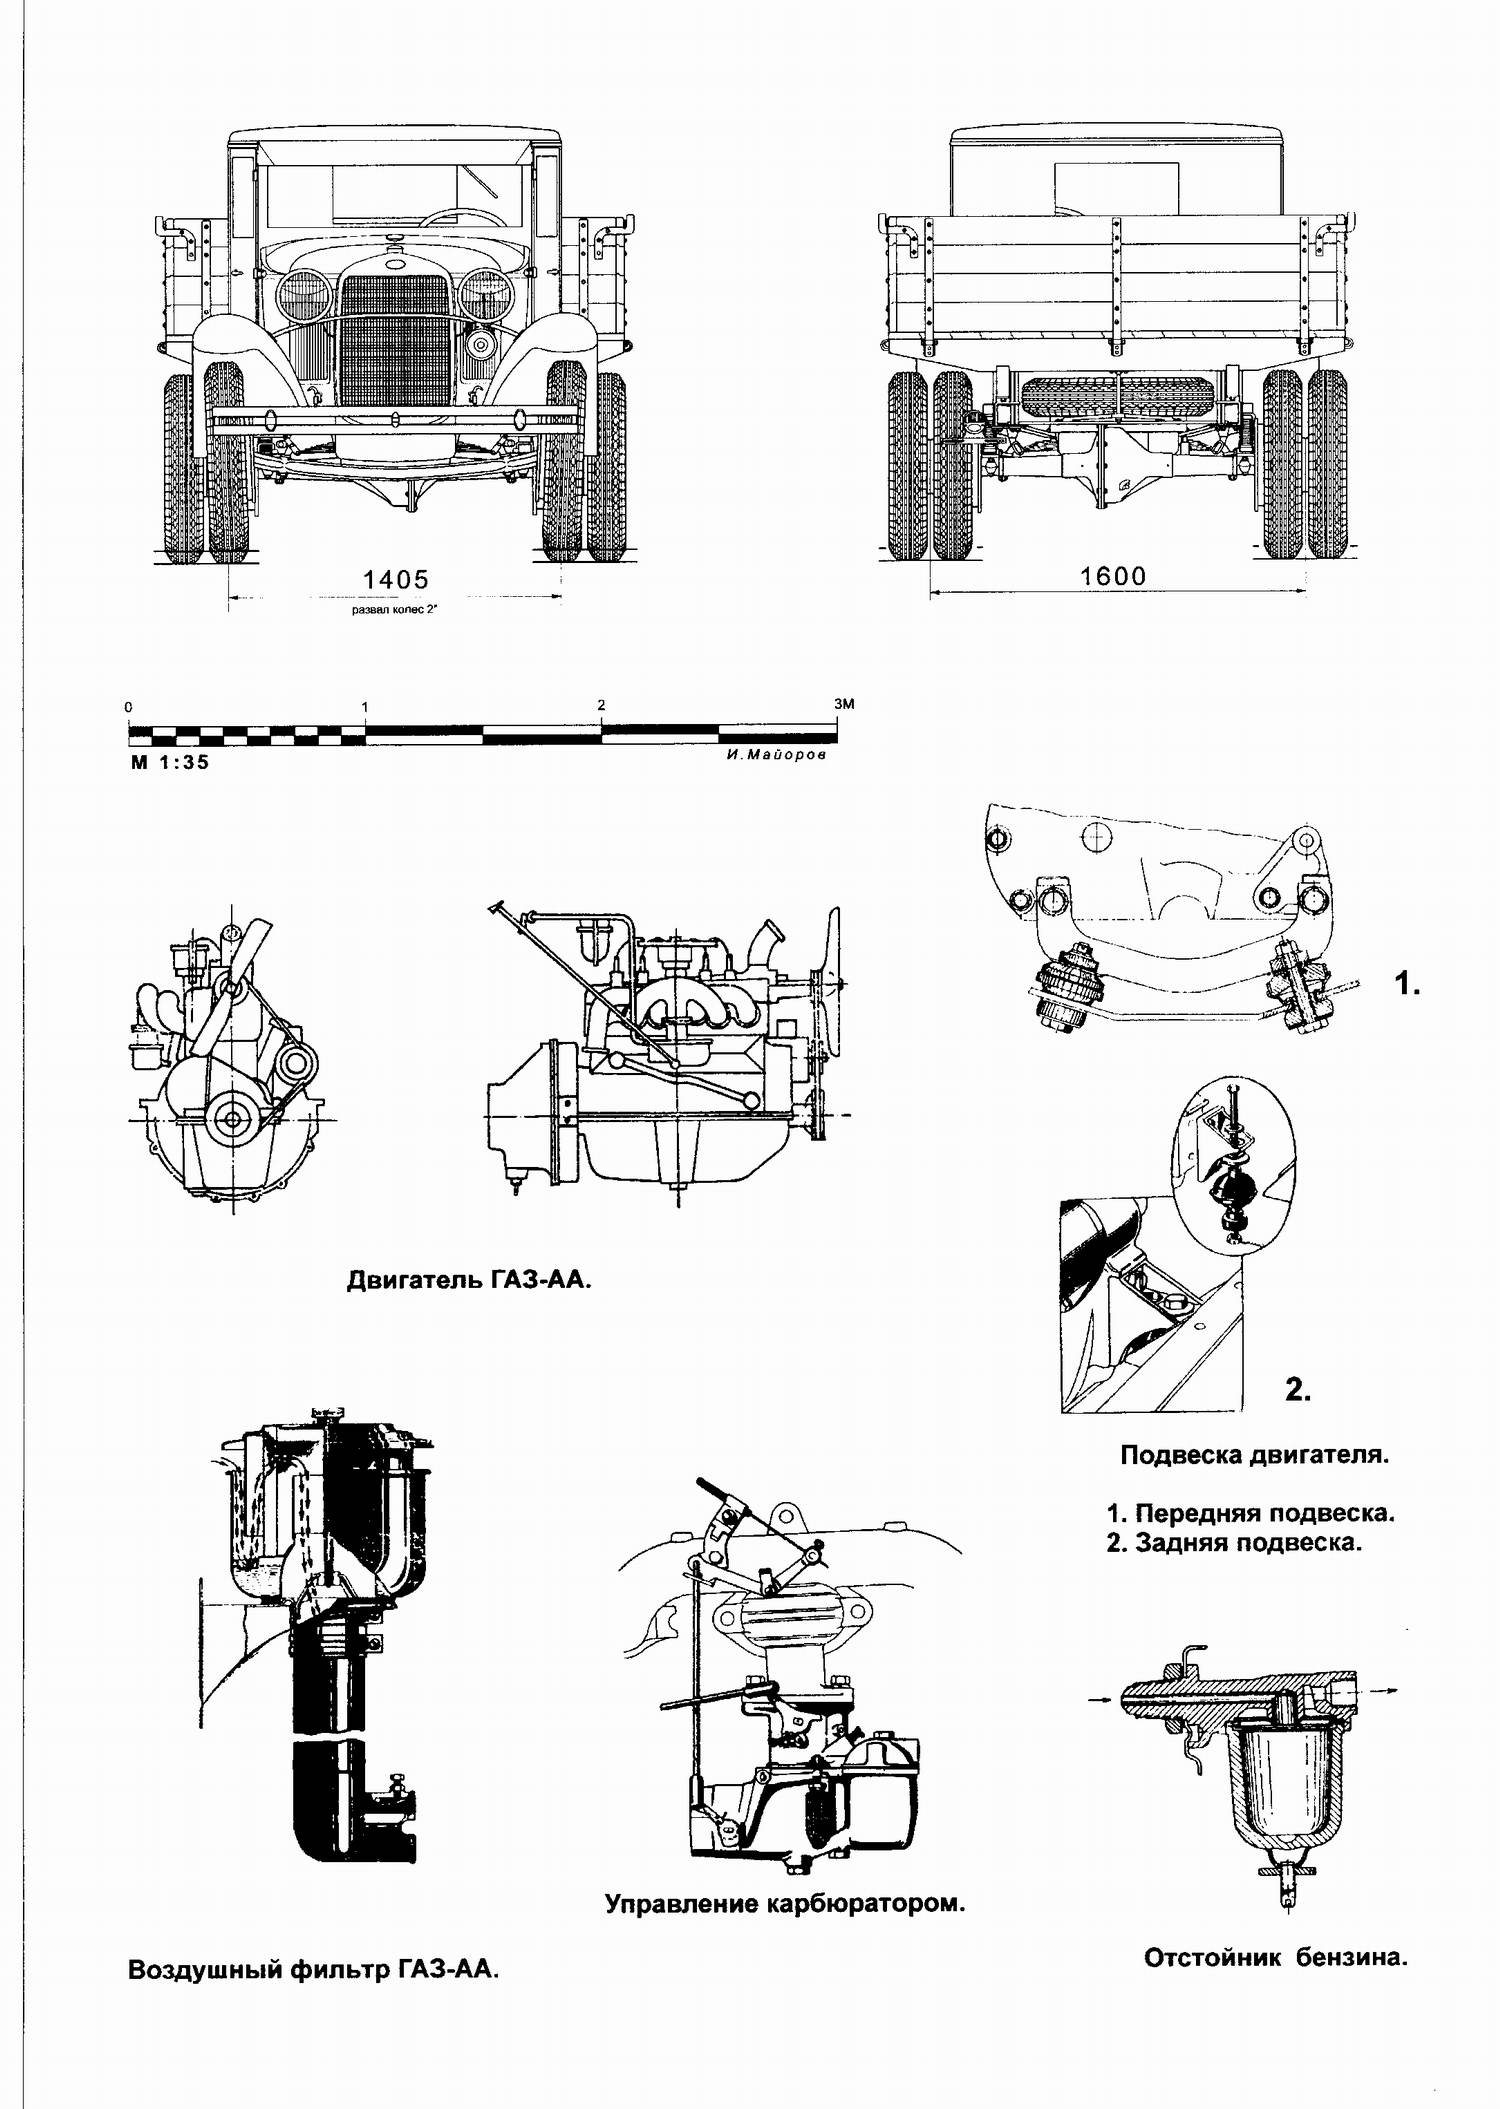 Armorama Lf Motor S Pics Of The Russian Truck Gaz Aaa